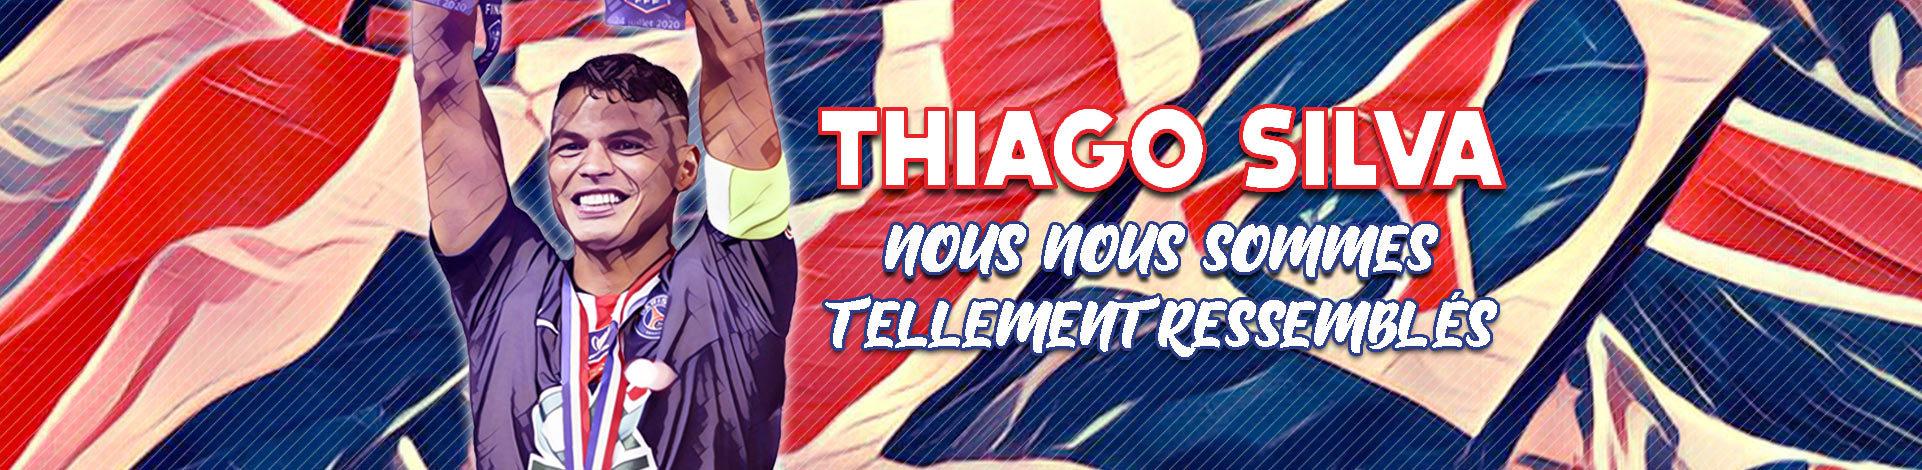 Thiago Silva Virage PSG